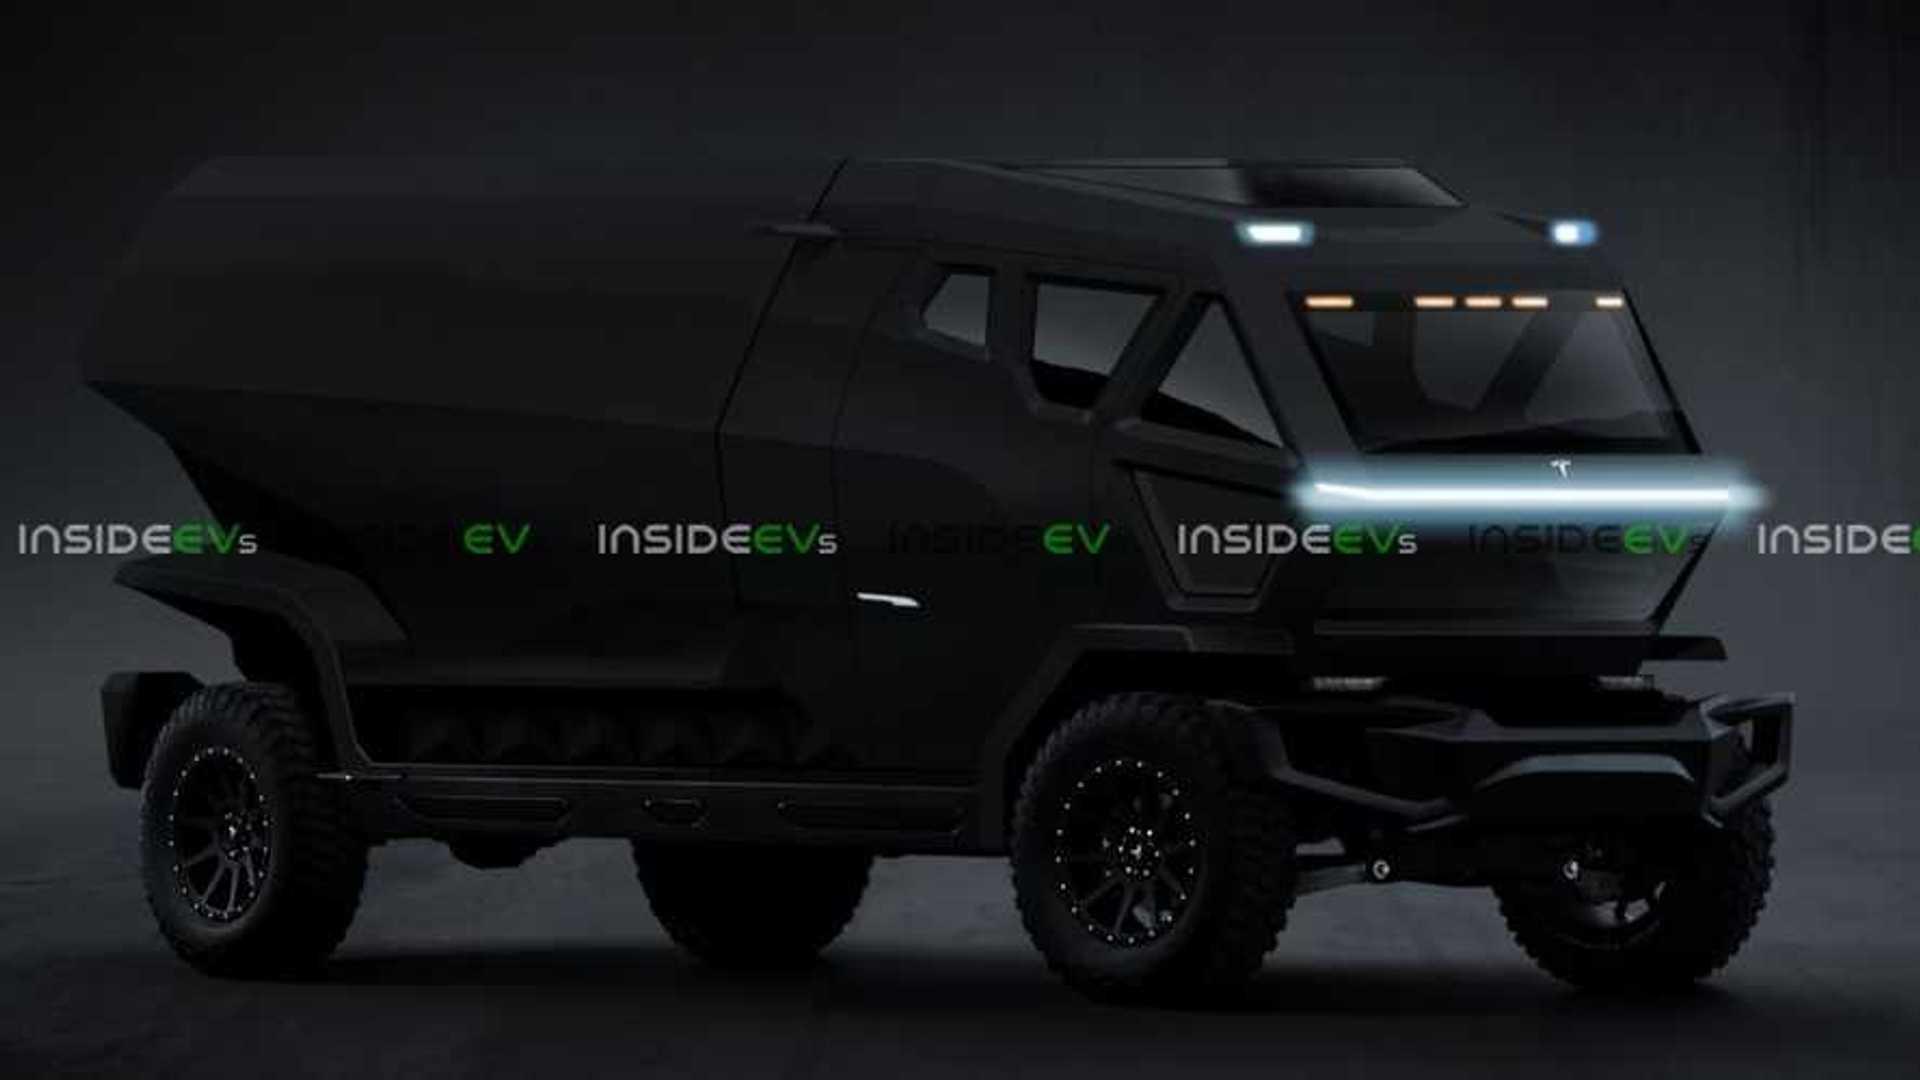 Tesla Pickup Truck Render Looks Bold Sinister And Bad In Black